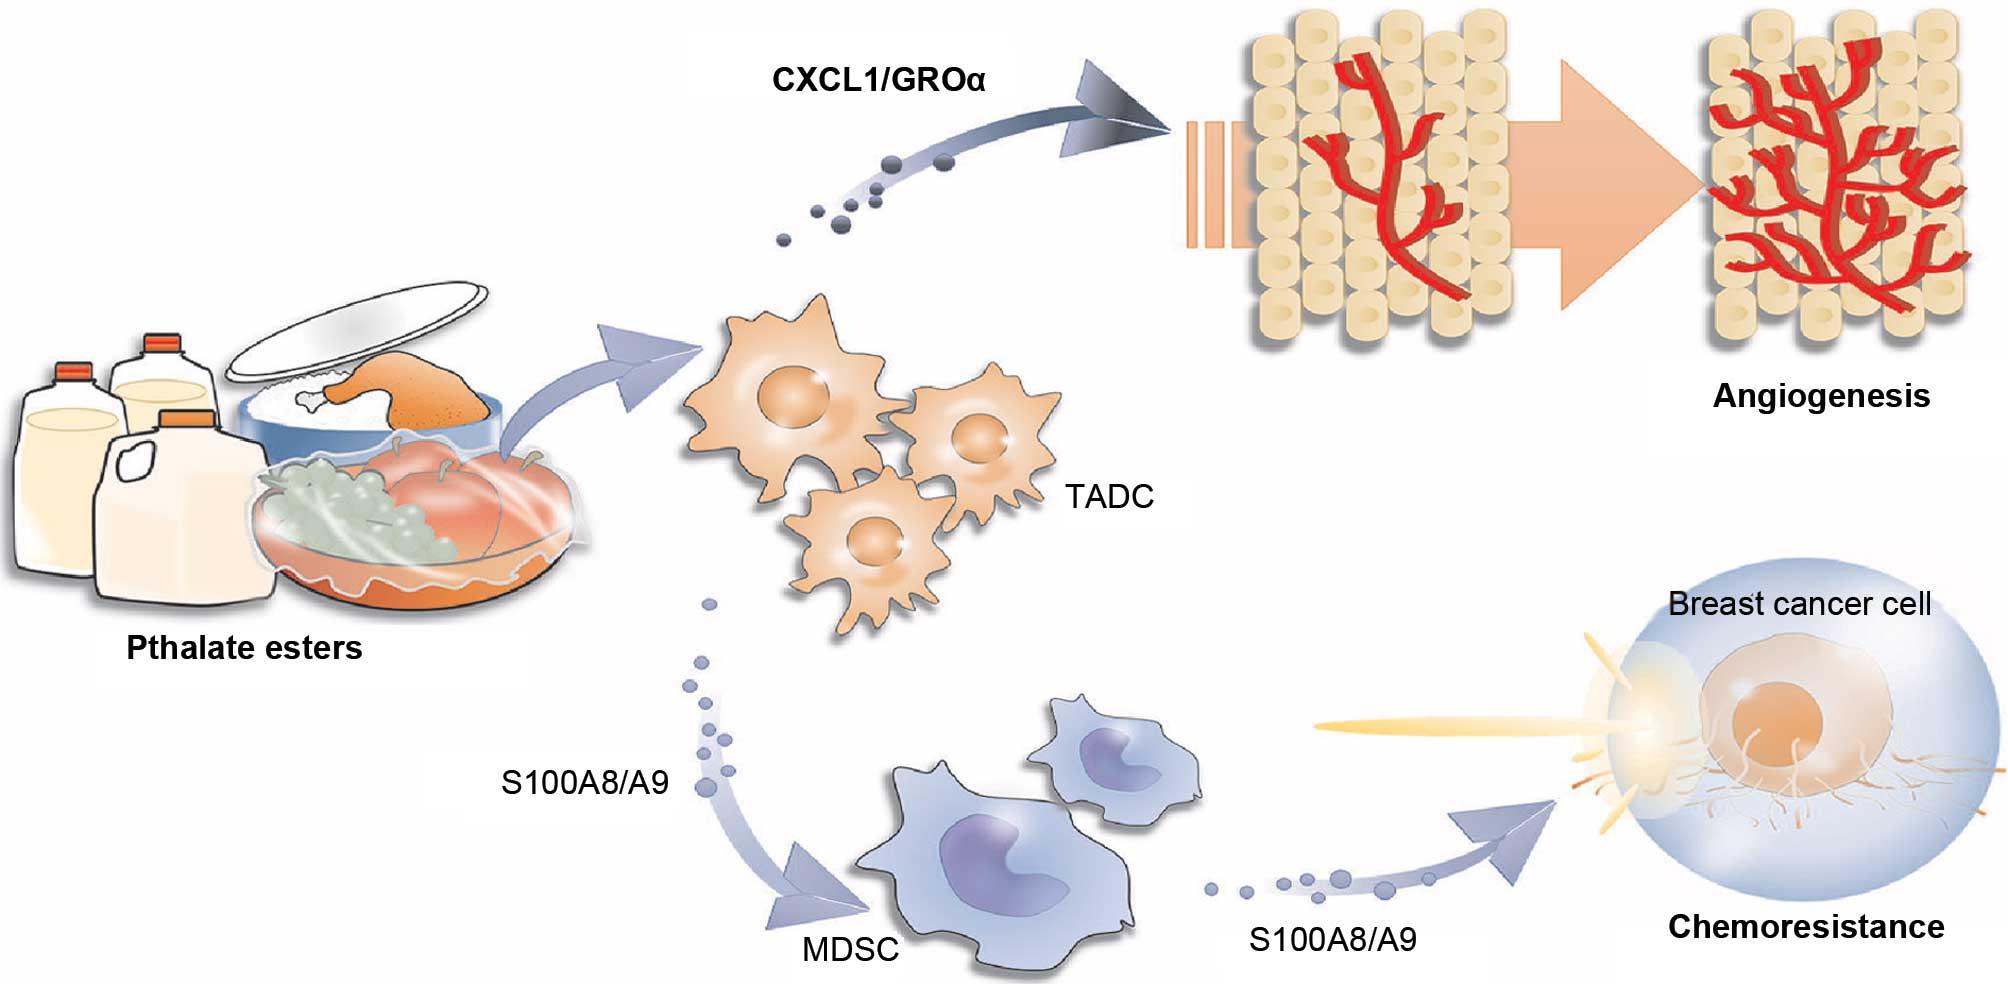 Cyclophosphamide Chemotherapy Regimens